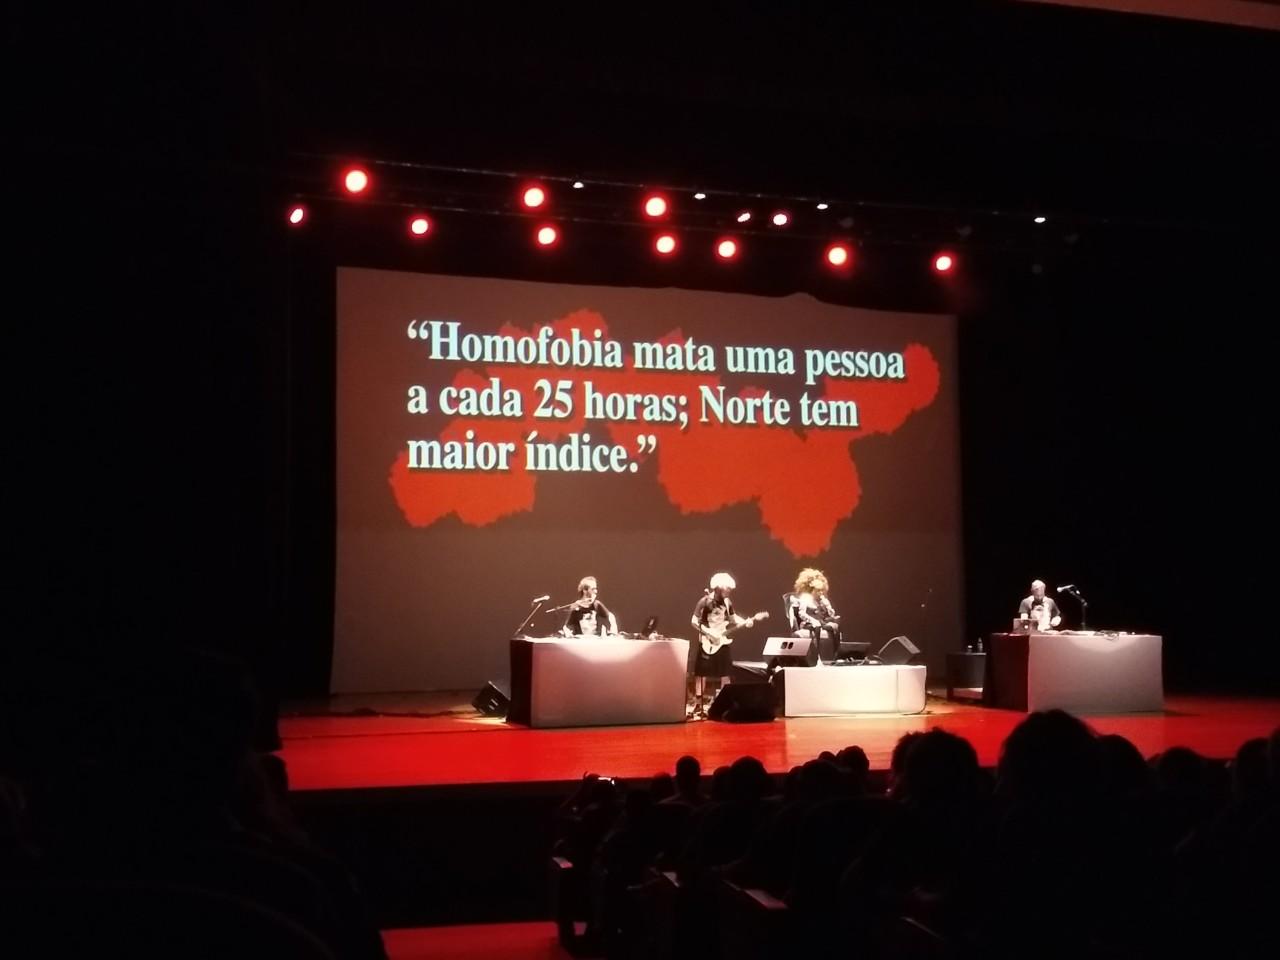 IMG 20180512 222617714 - ELZA SOARES: 'A Voz e a Máquina' contra a homofobia e os crimes de ódio